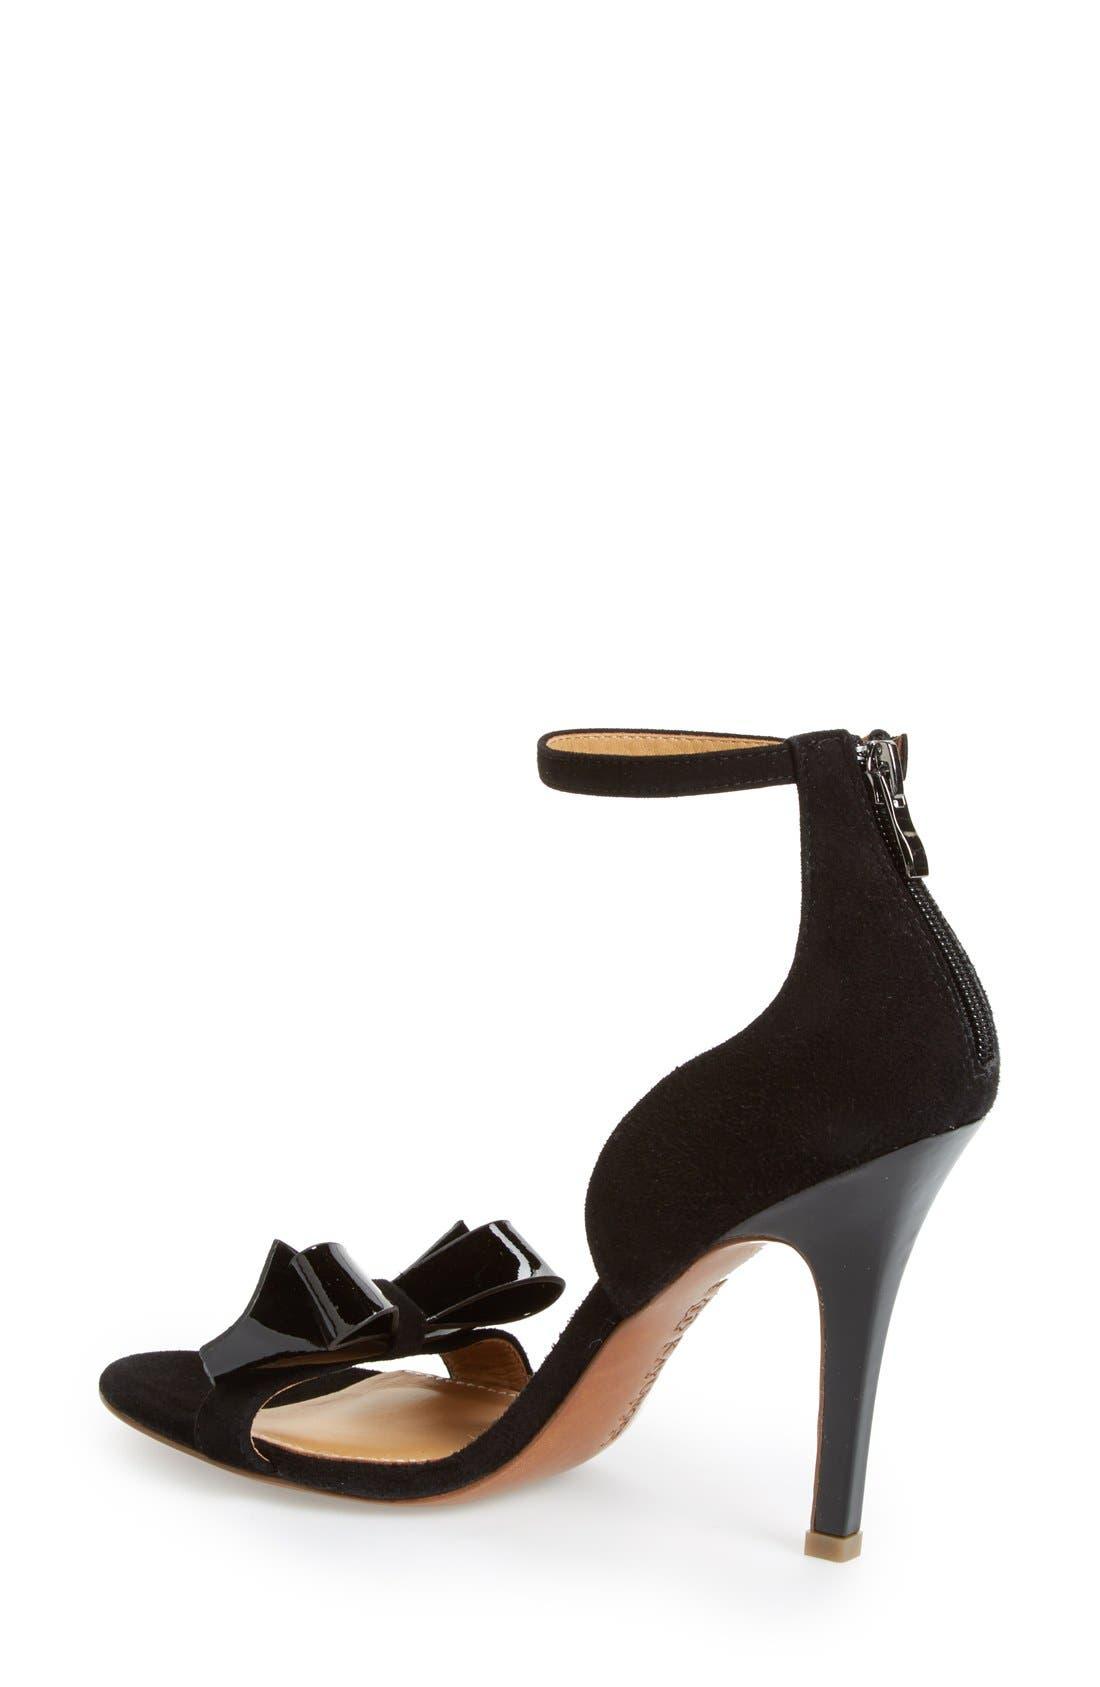 'Baroque' Ankle Strap Sandal,                             Alternate thumbnail 4, color,                             001